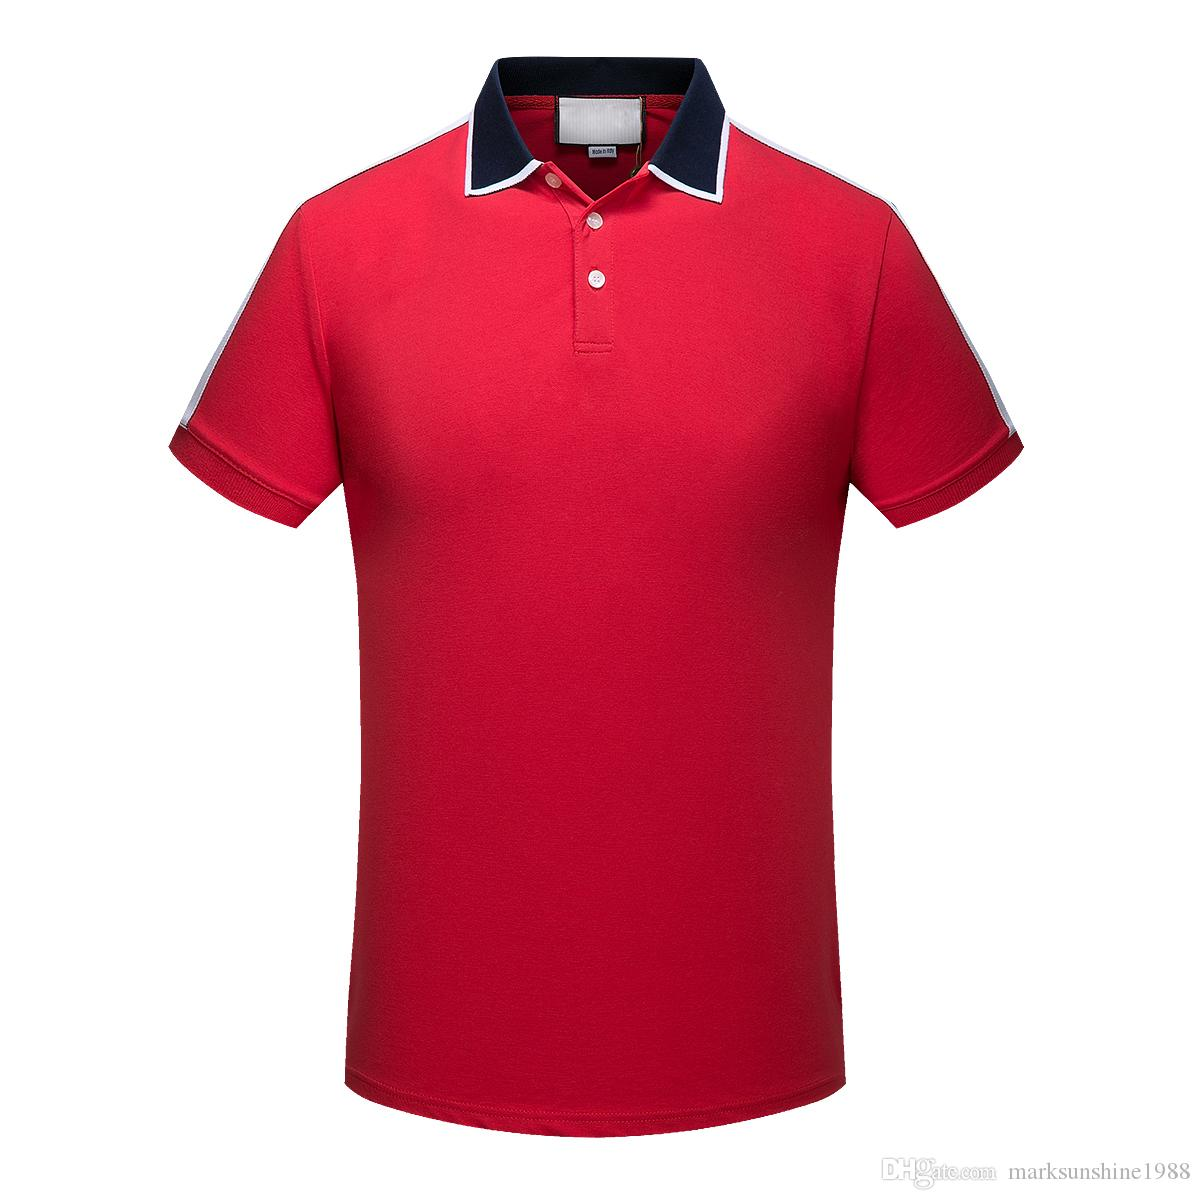 2018 Summer Fashion Polo Shirt Fashion Short Sleeved Animal